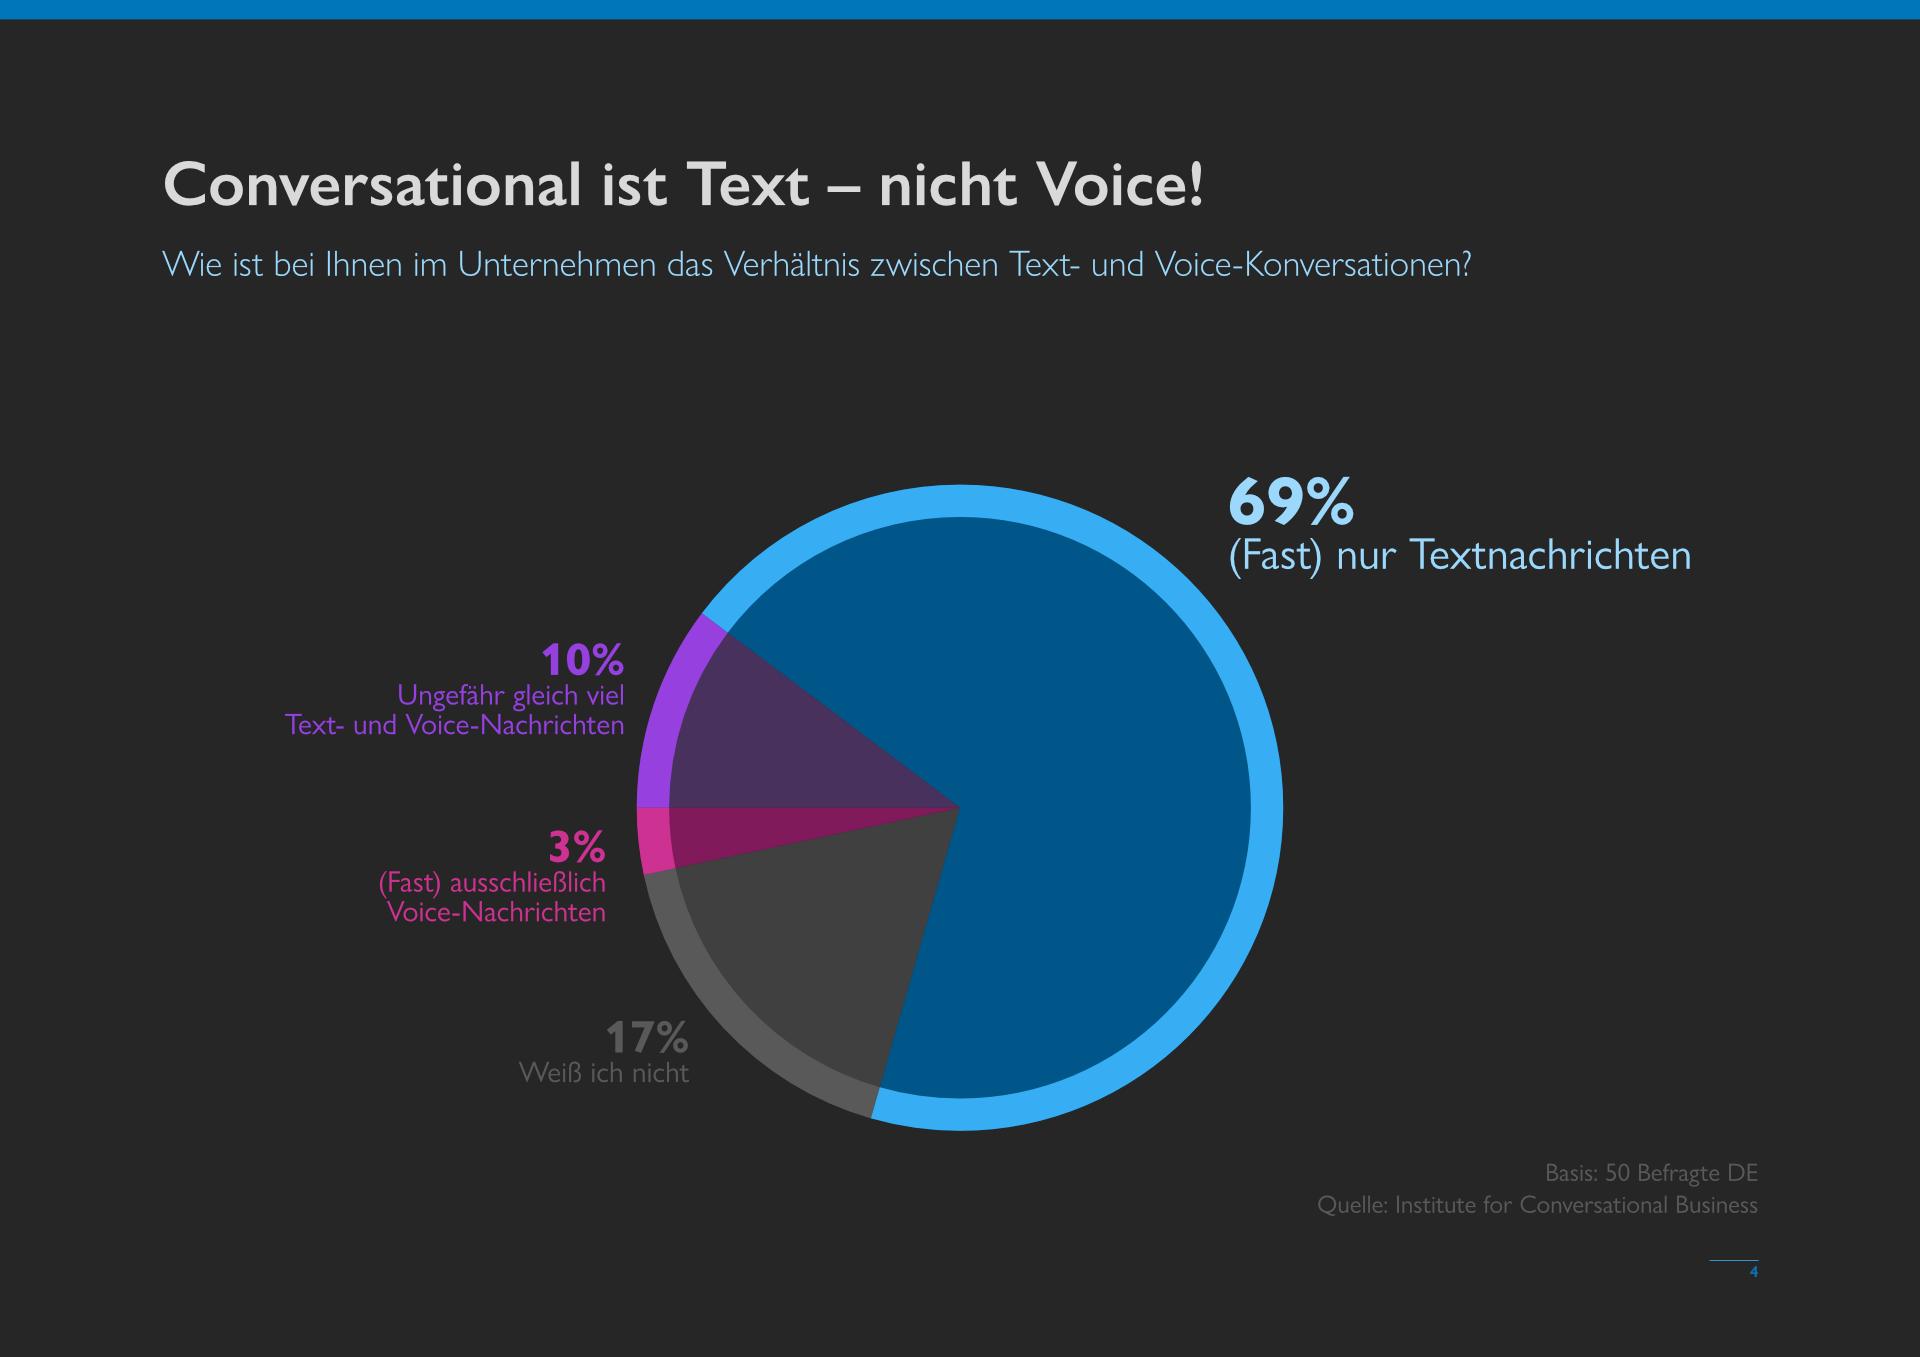 Conversational Business Messenger vs. Sprachassistenten - MessengerPeople Studie 2021